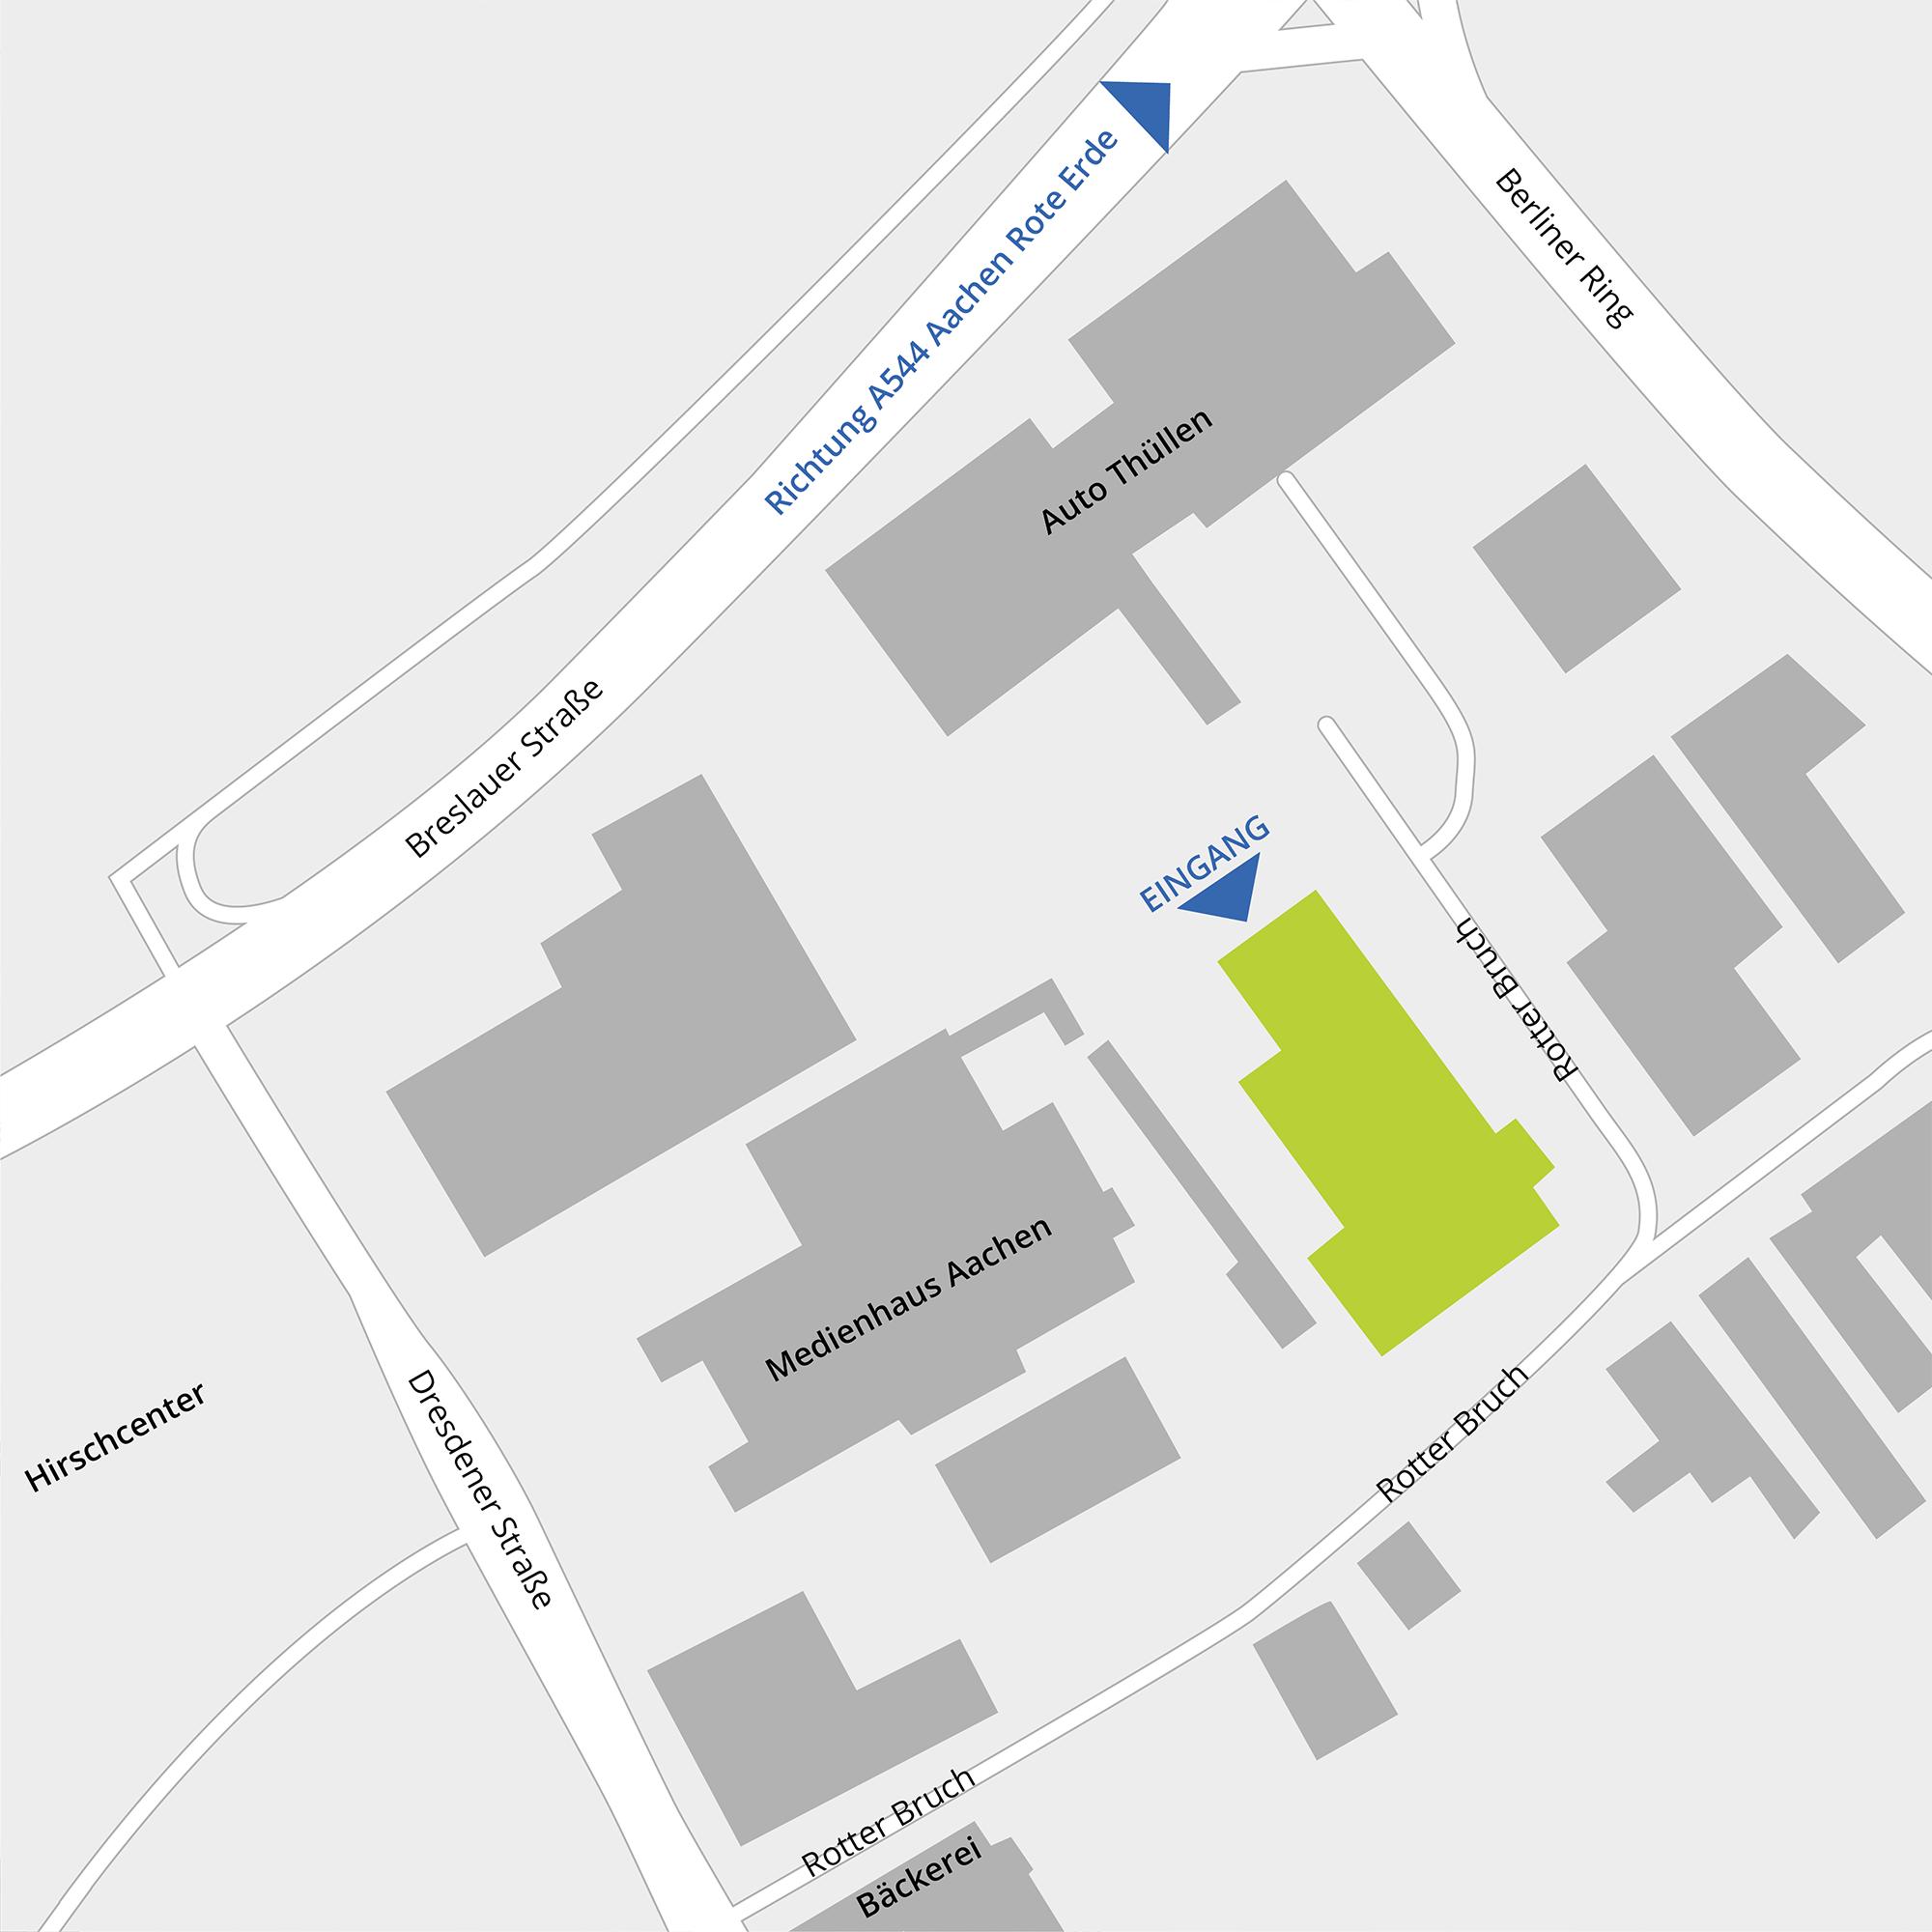 Anfahrtsskizze ARTLand GmbH Aachen